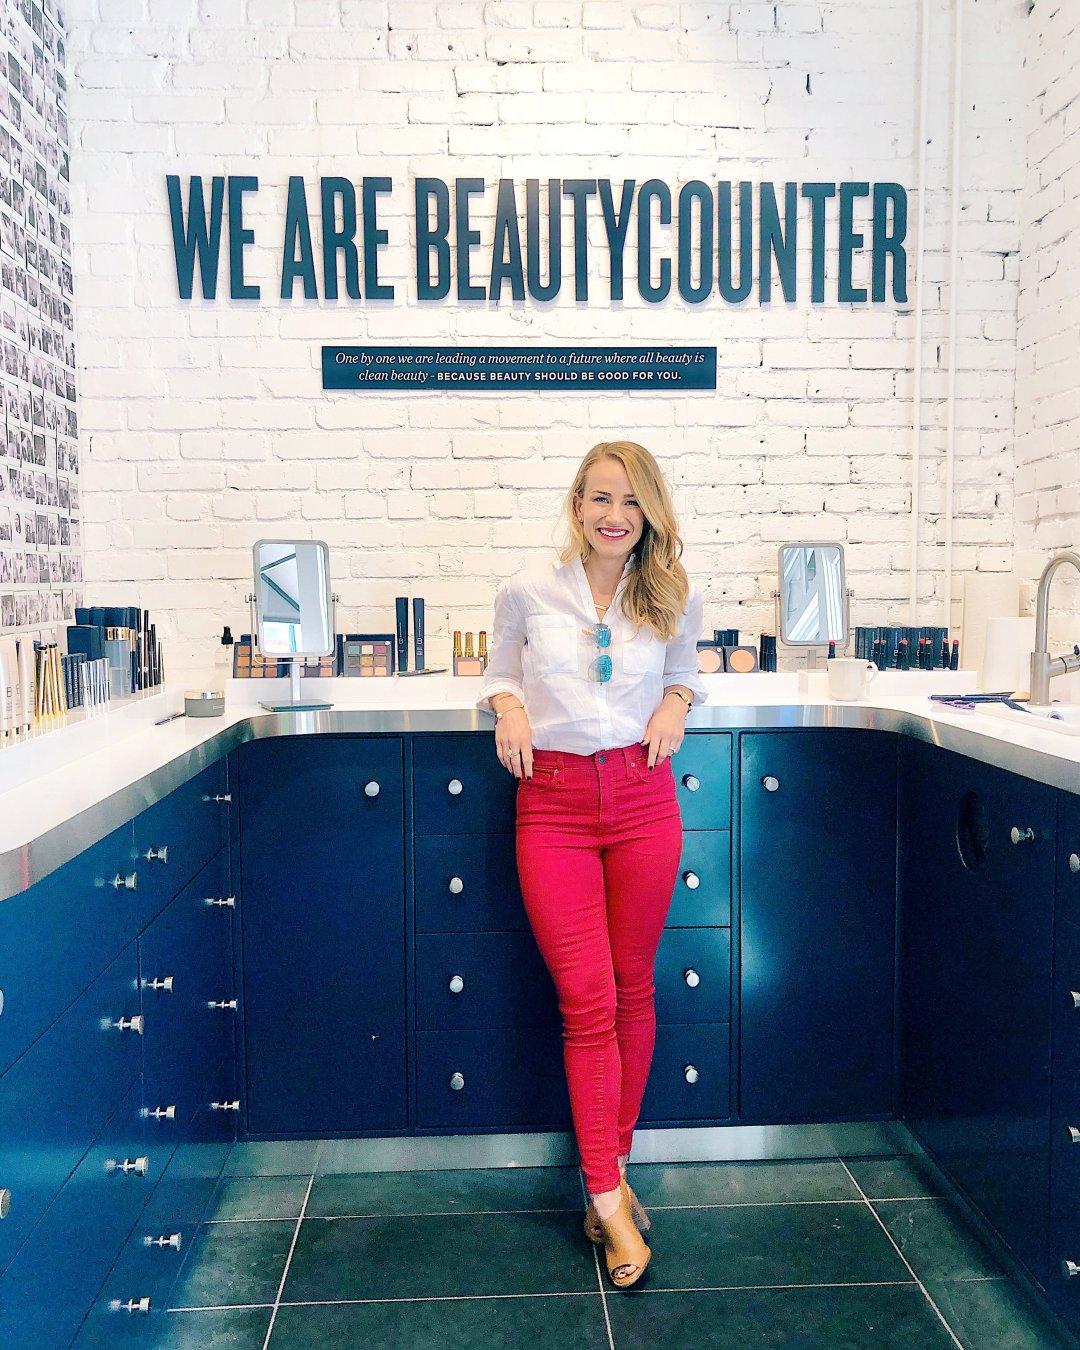 Beautycounter experience